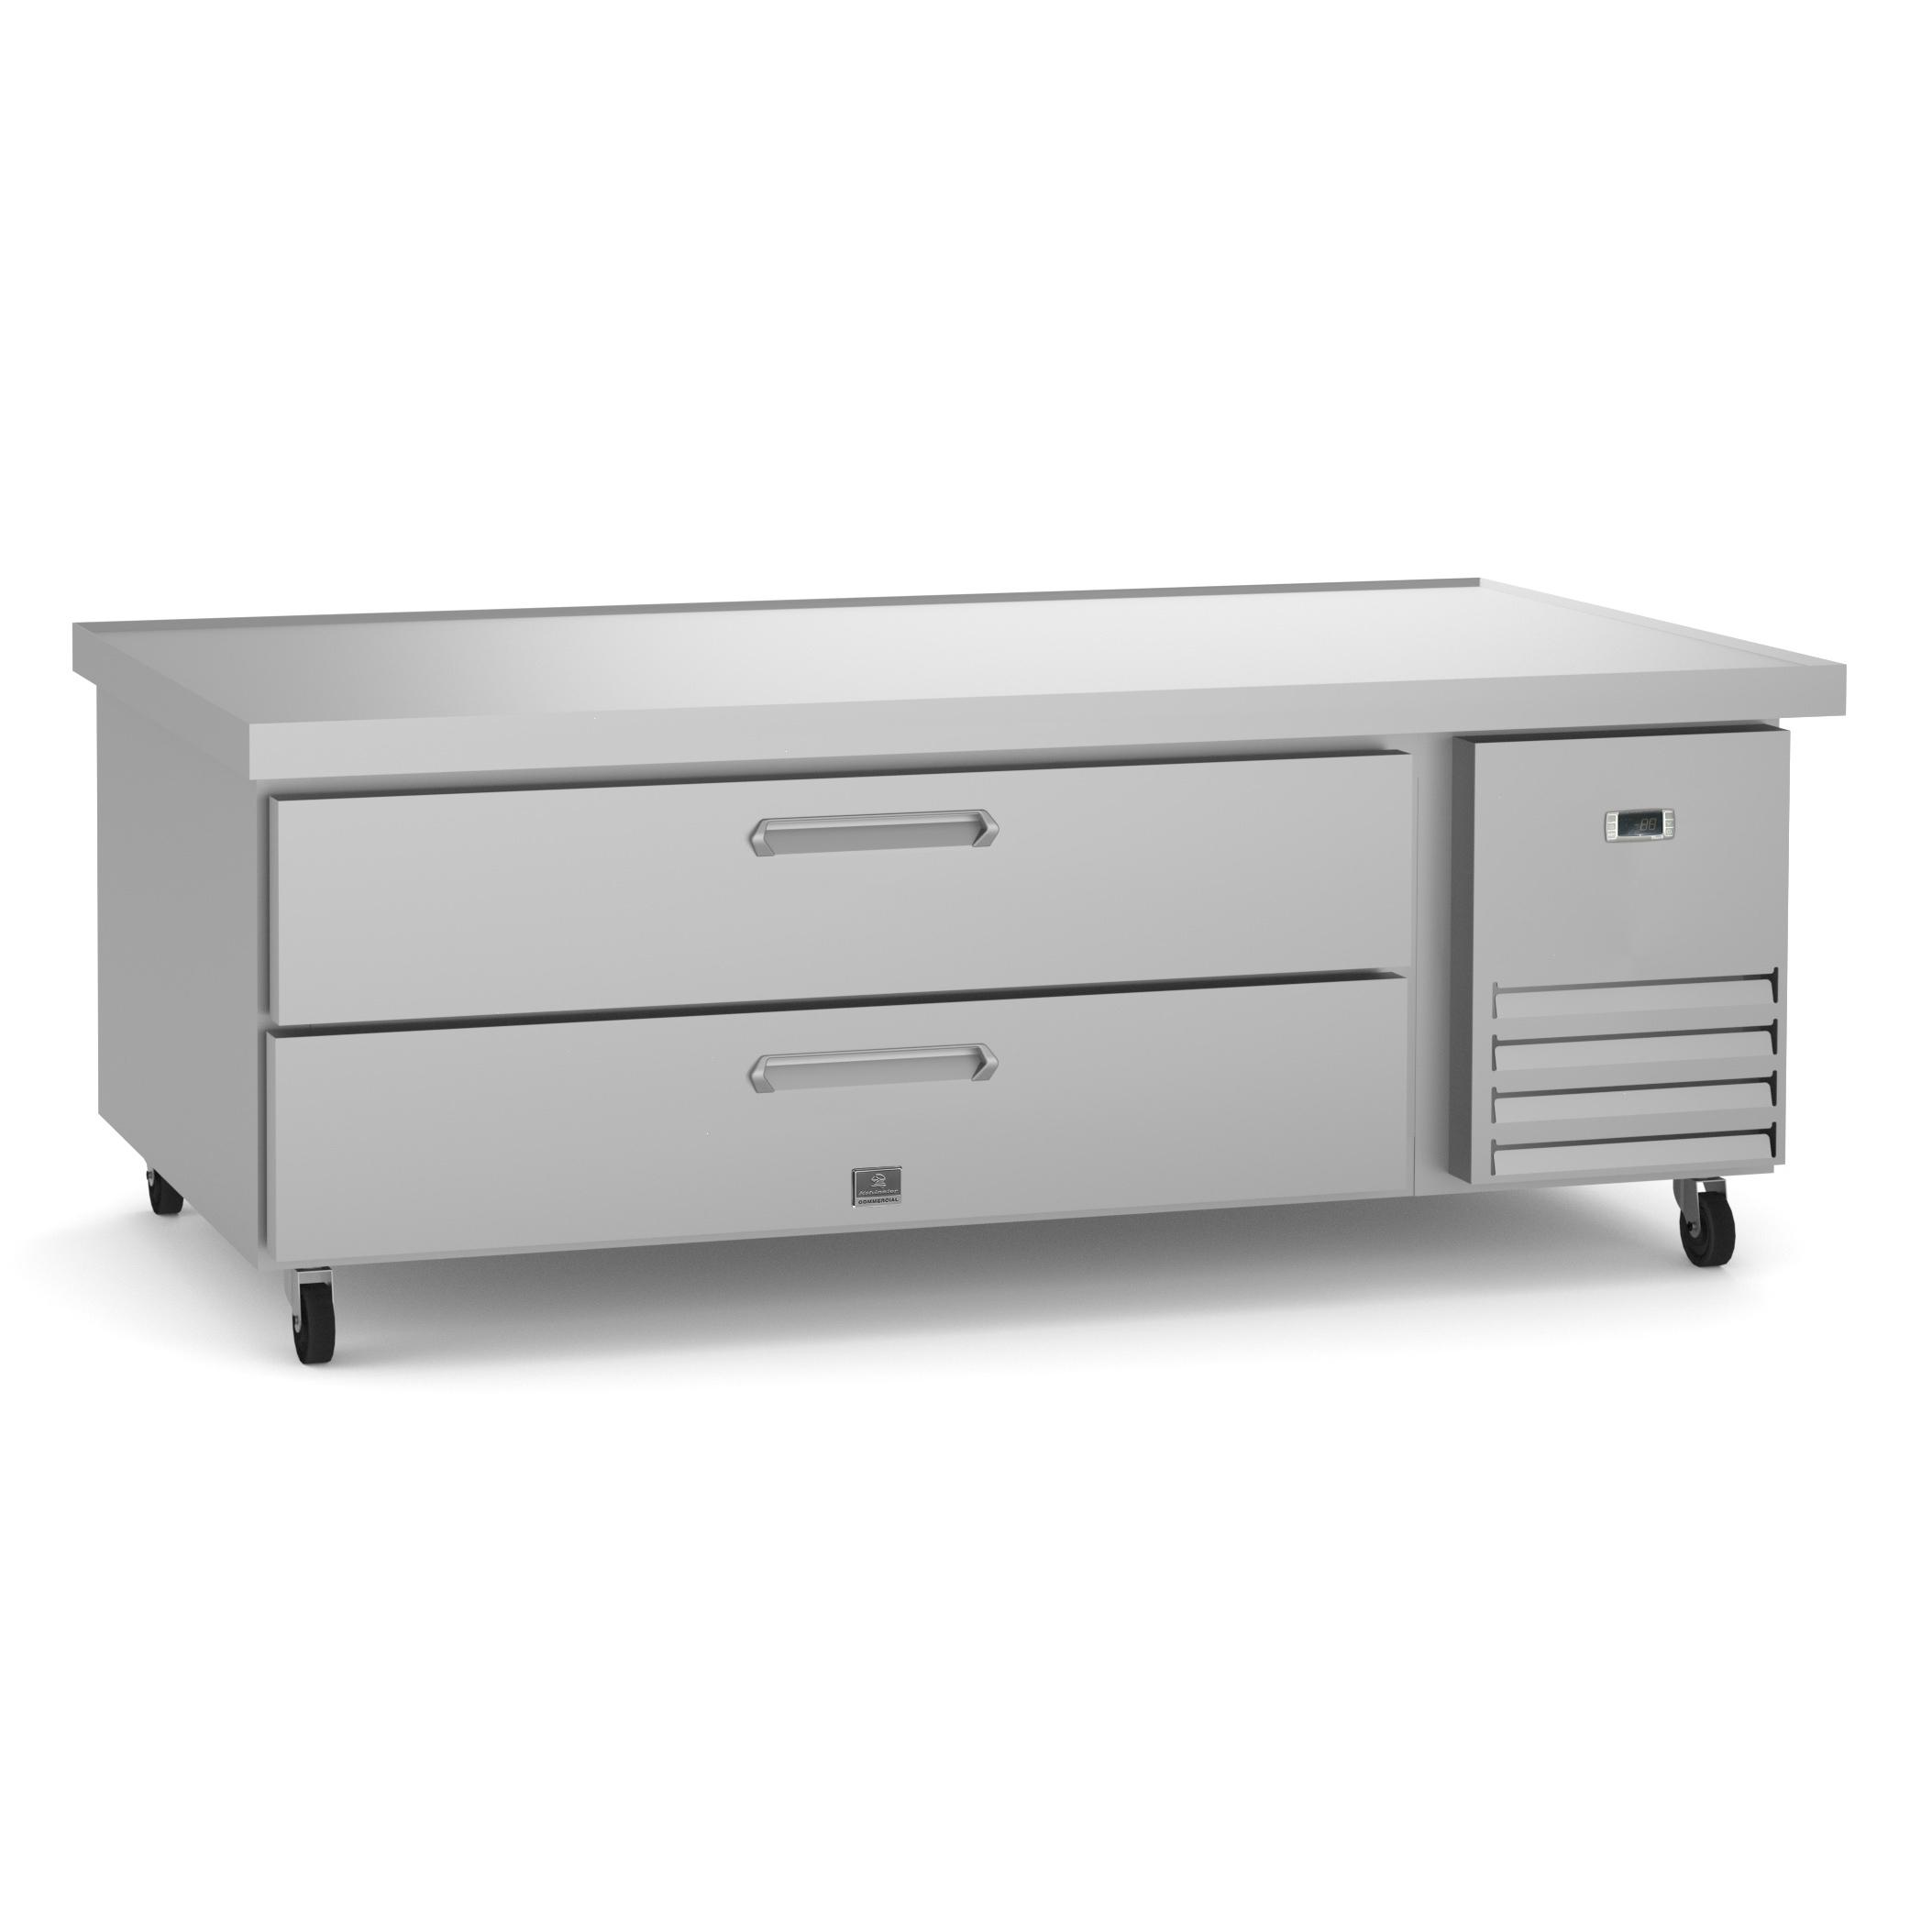 Kelvinator Commercial KCHCB60R equipment stand, refrigerated base